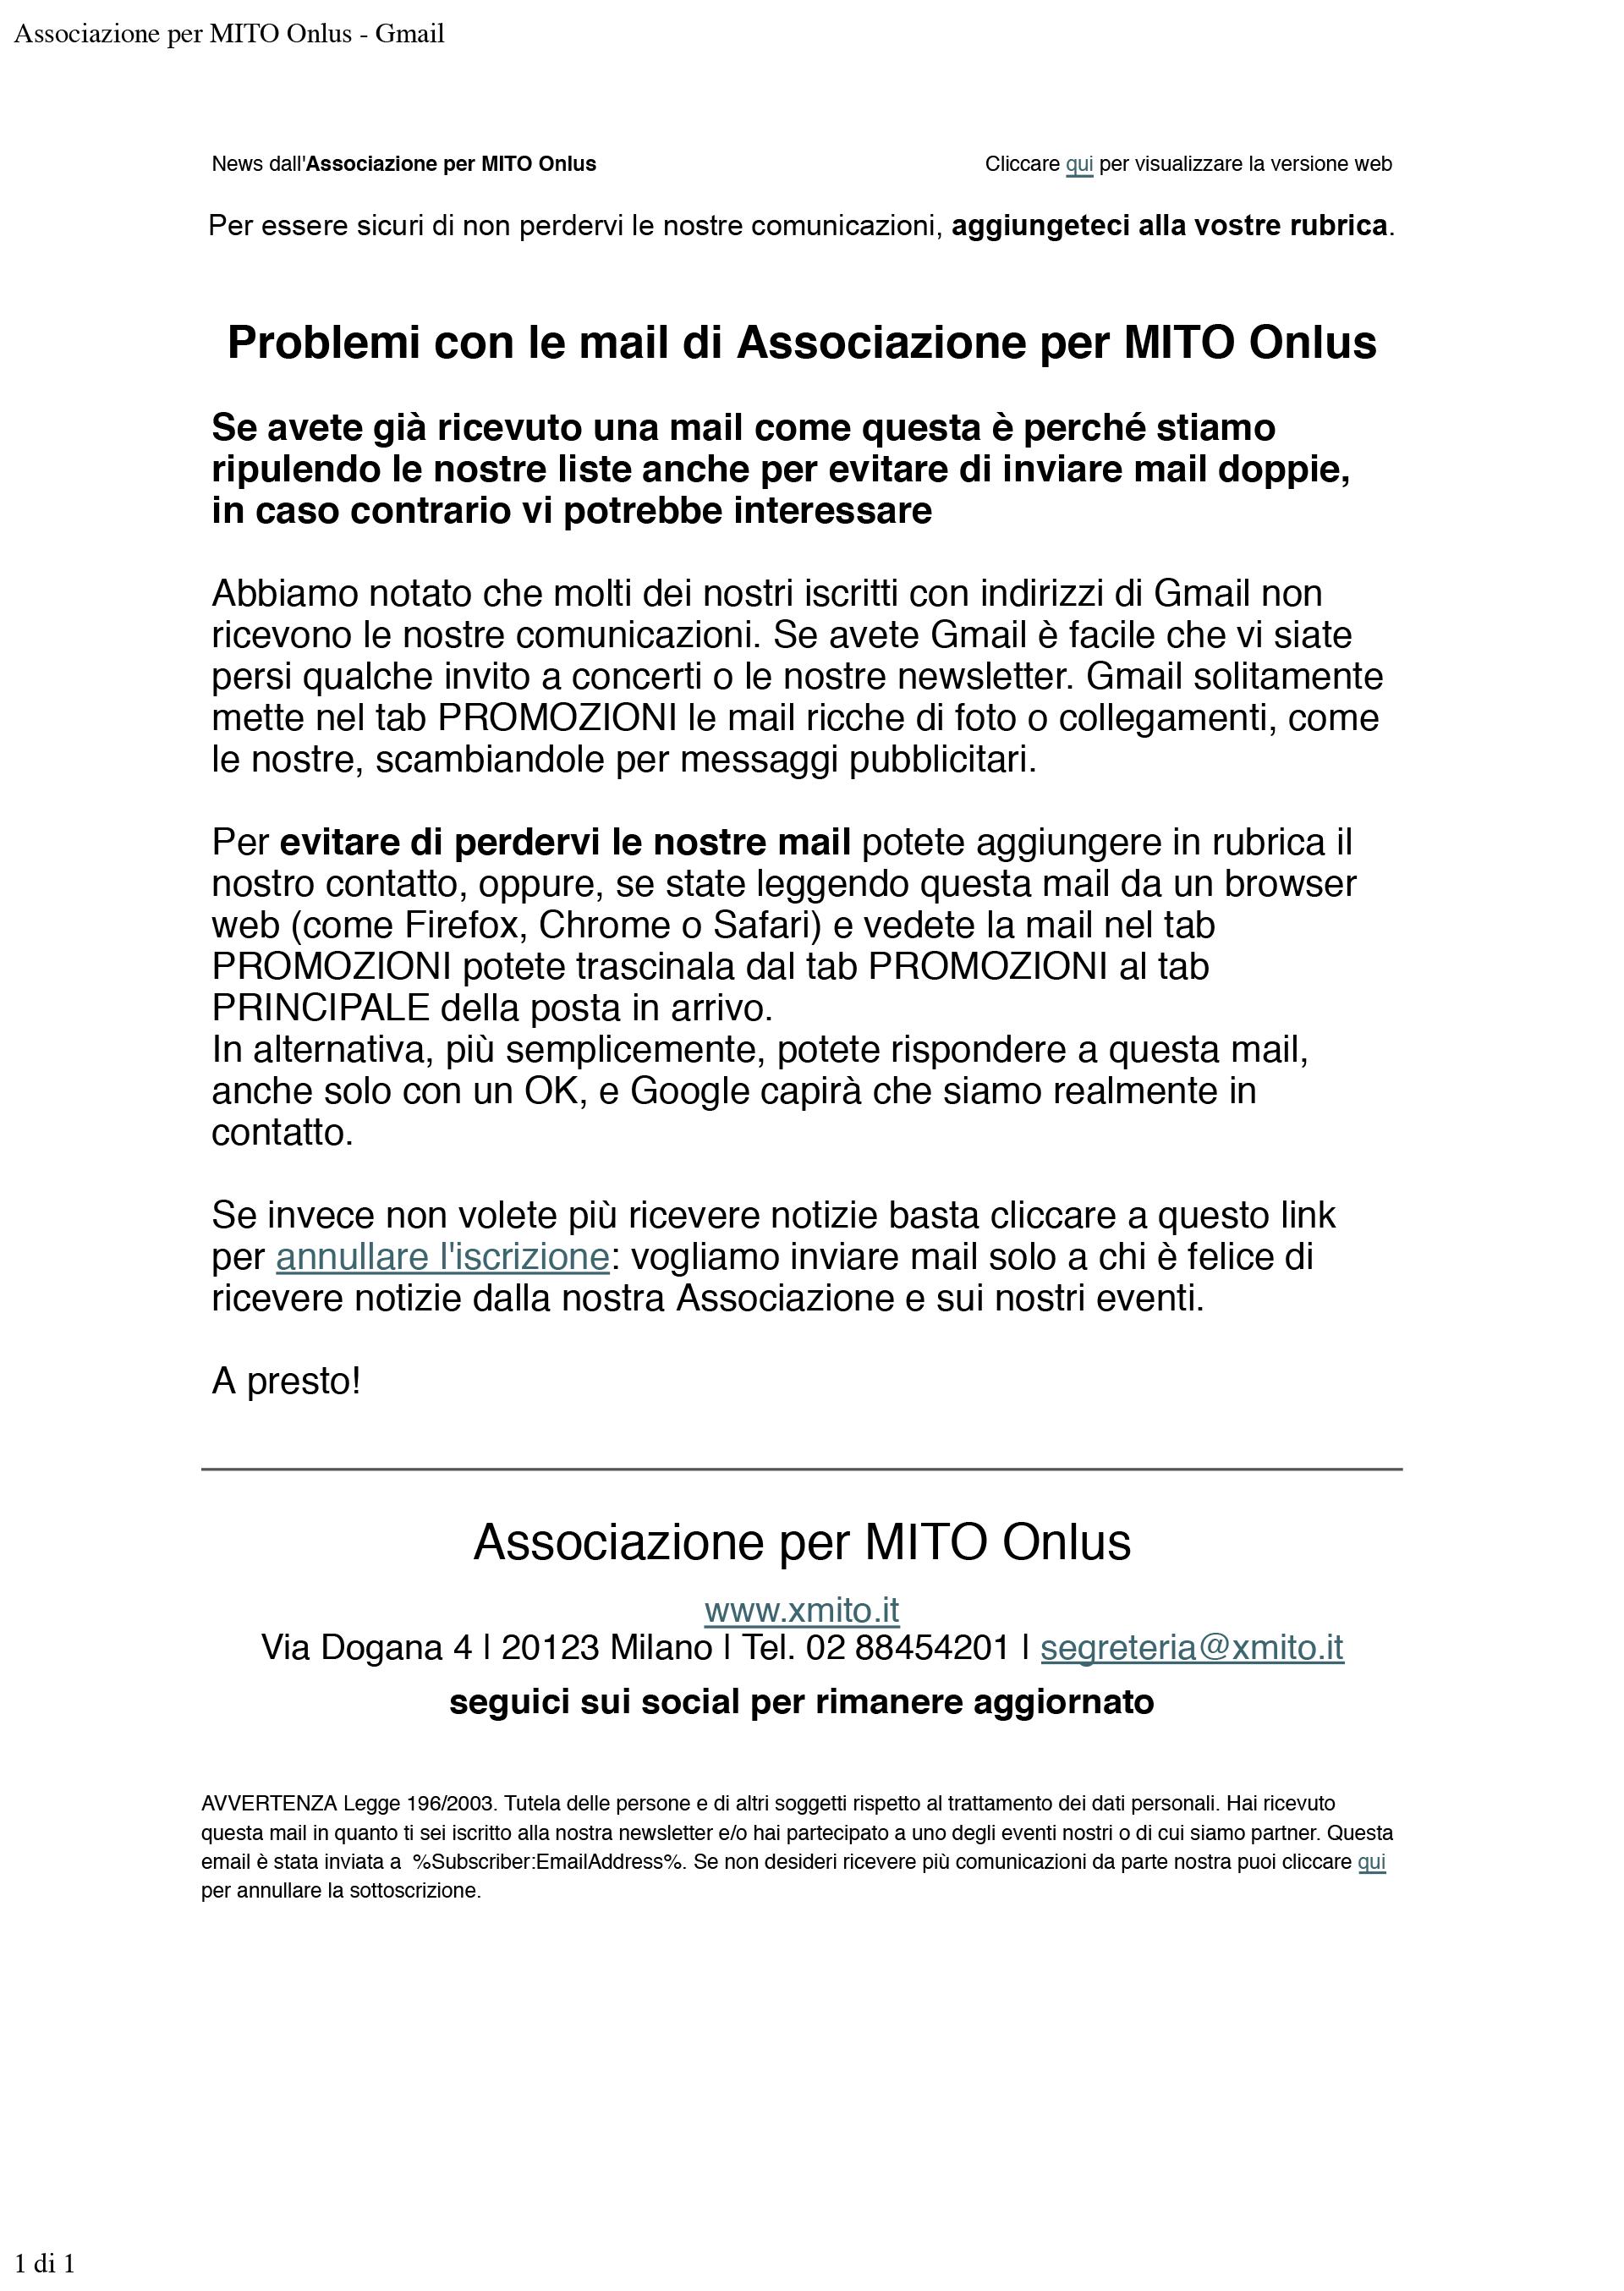 2018-12-14-AssociazioneperMITOOnlus-Gmail